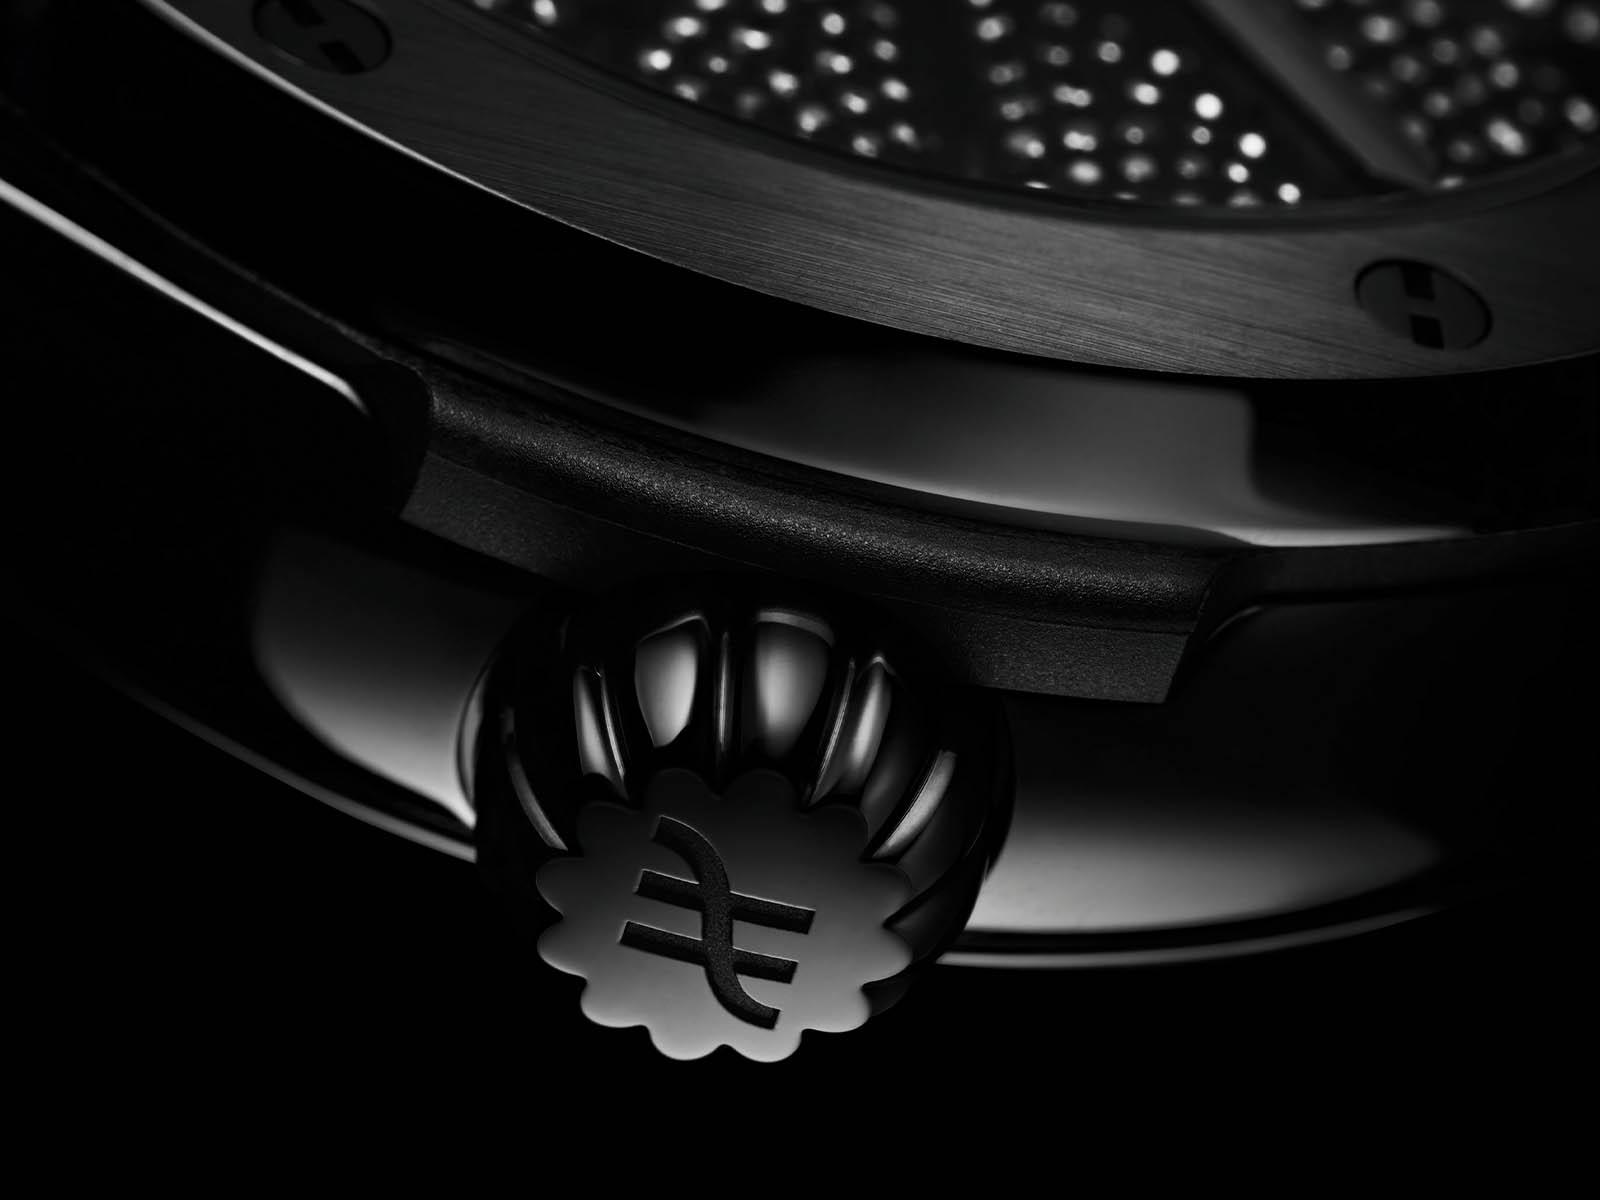 507-cx-9000-rx-tak21-hublot-classic-fusion-takashi-murakami-all-black-9.jpg